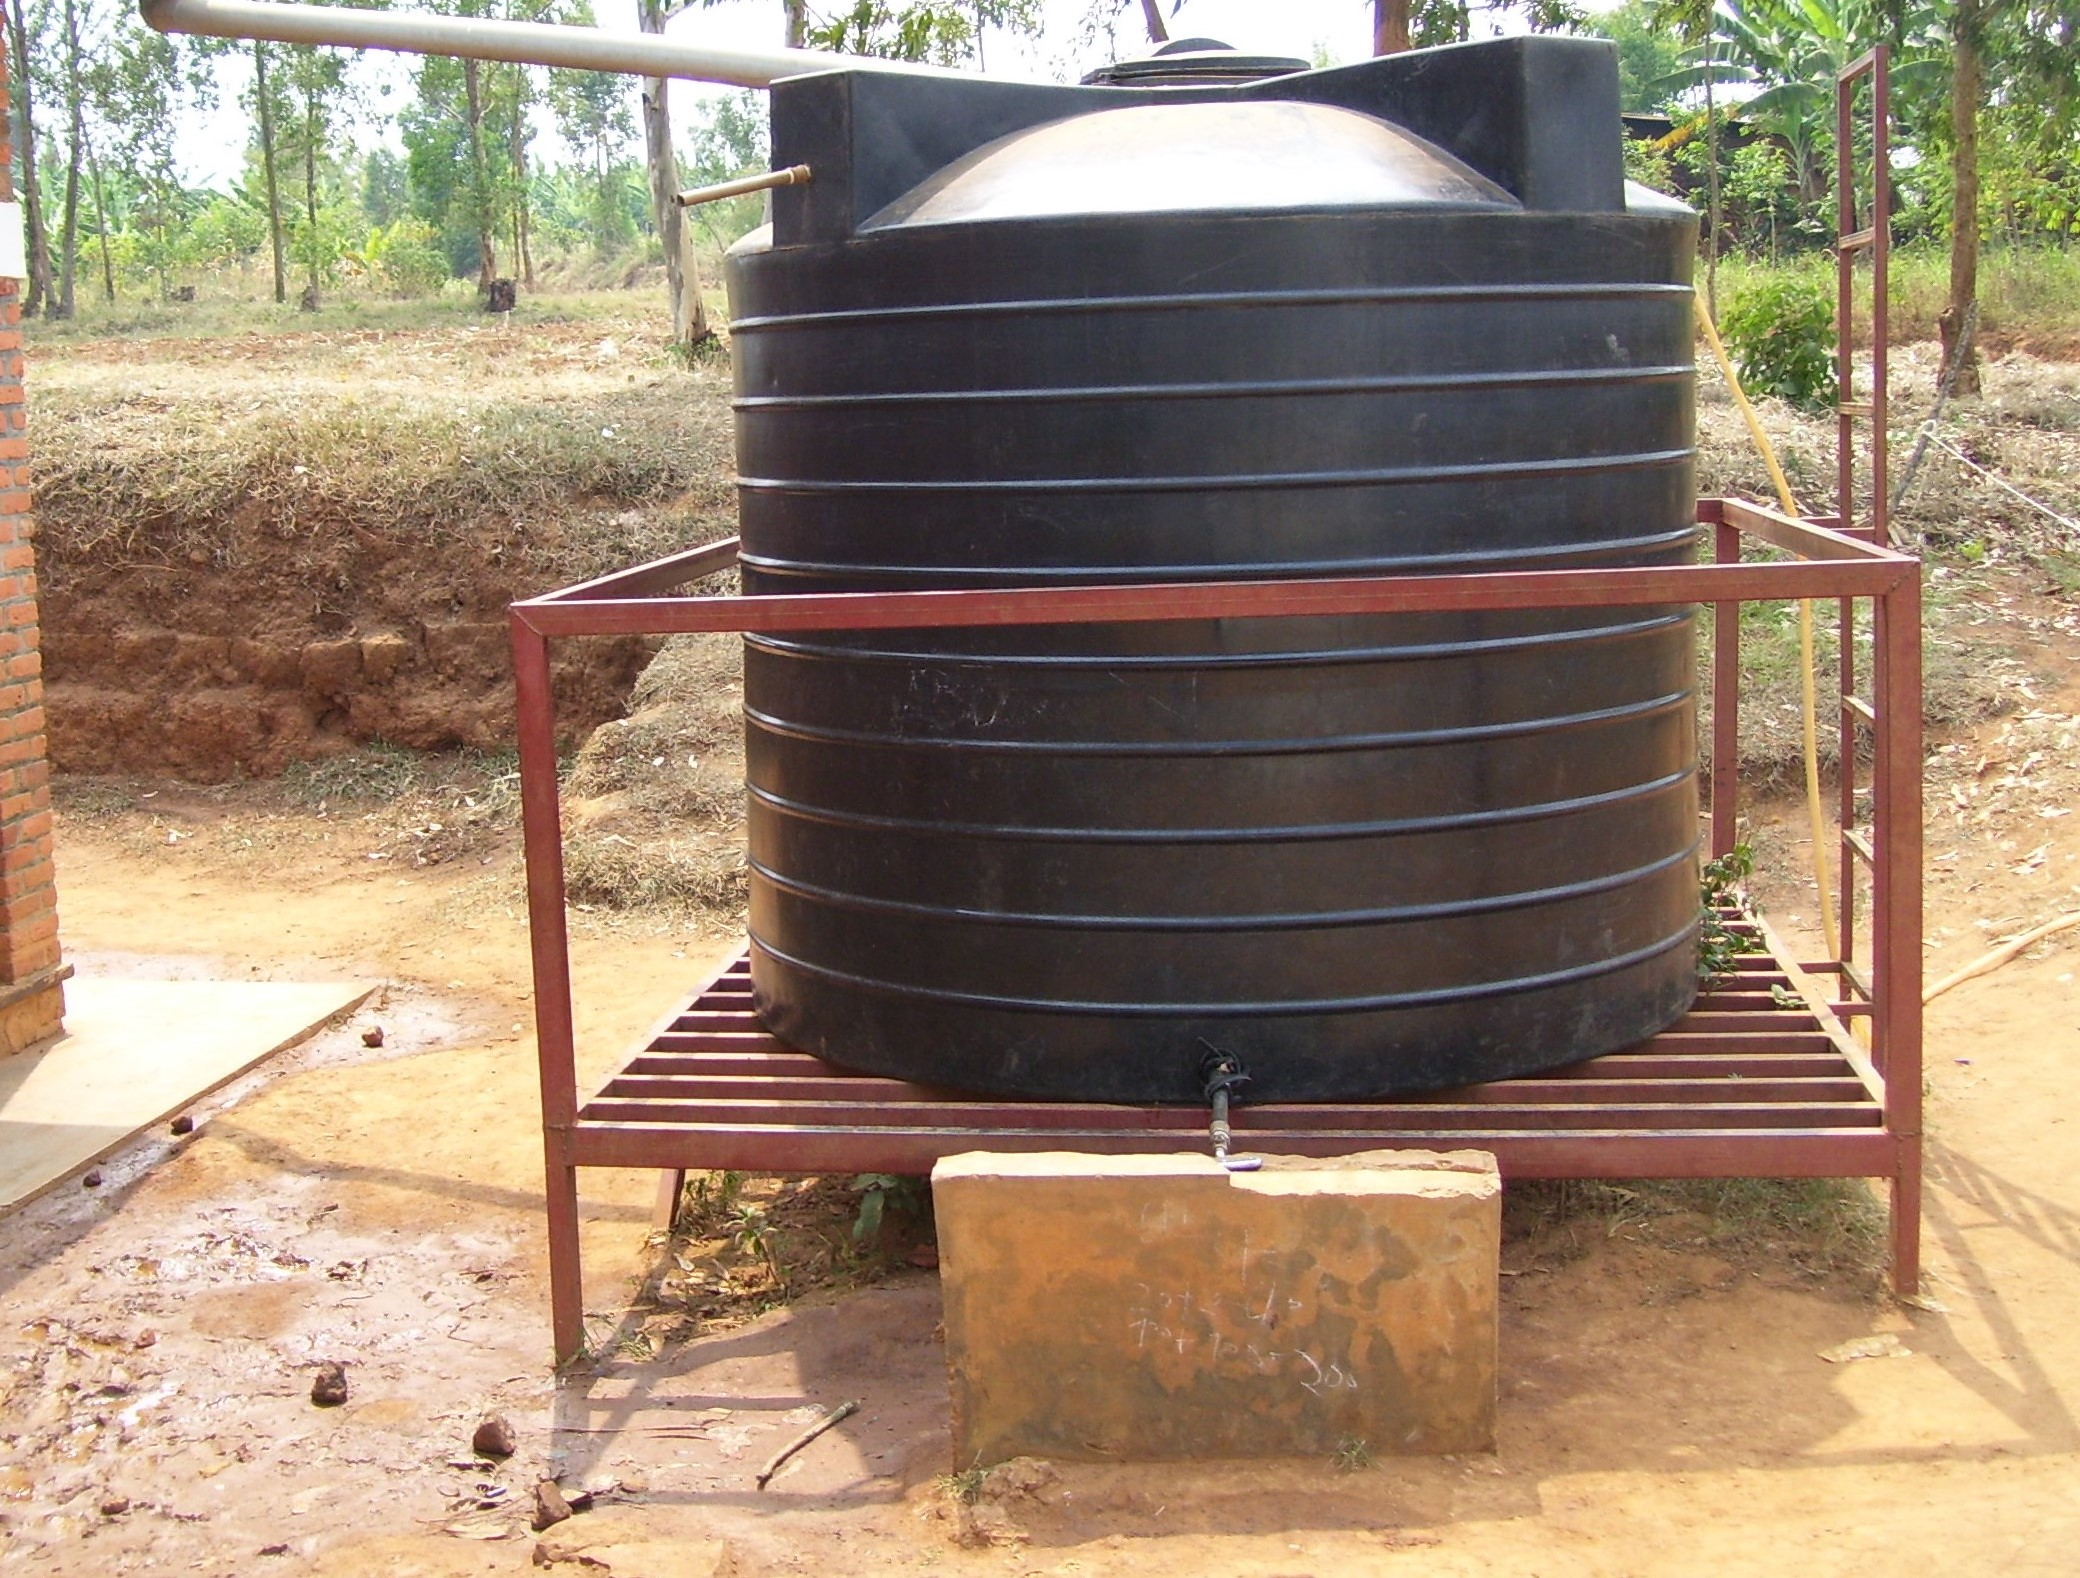 Rainwater_harvesting_tank